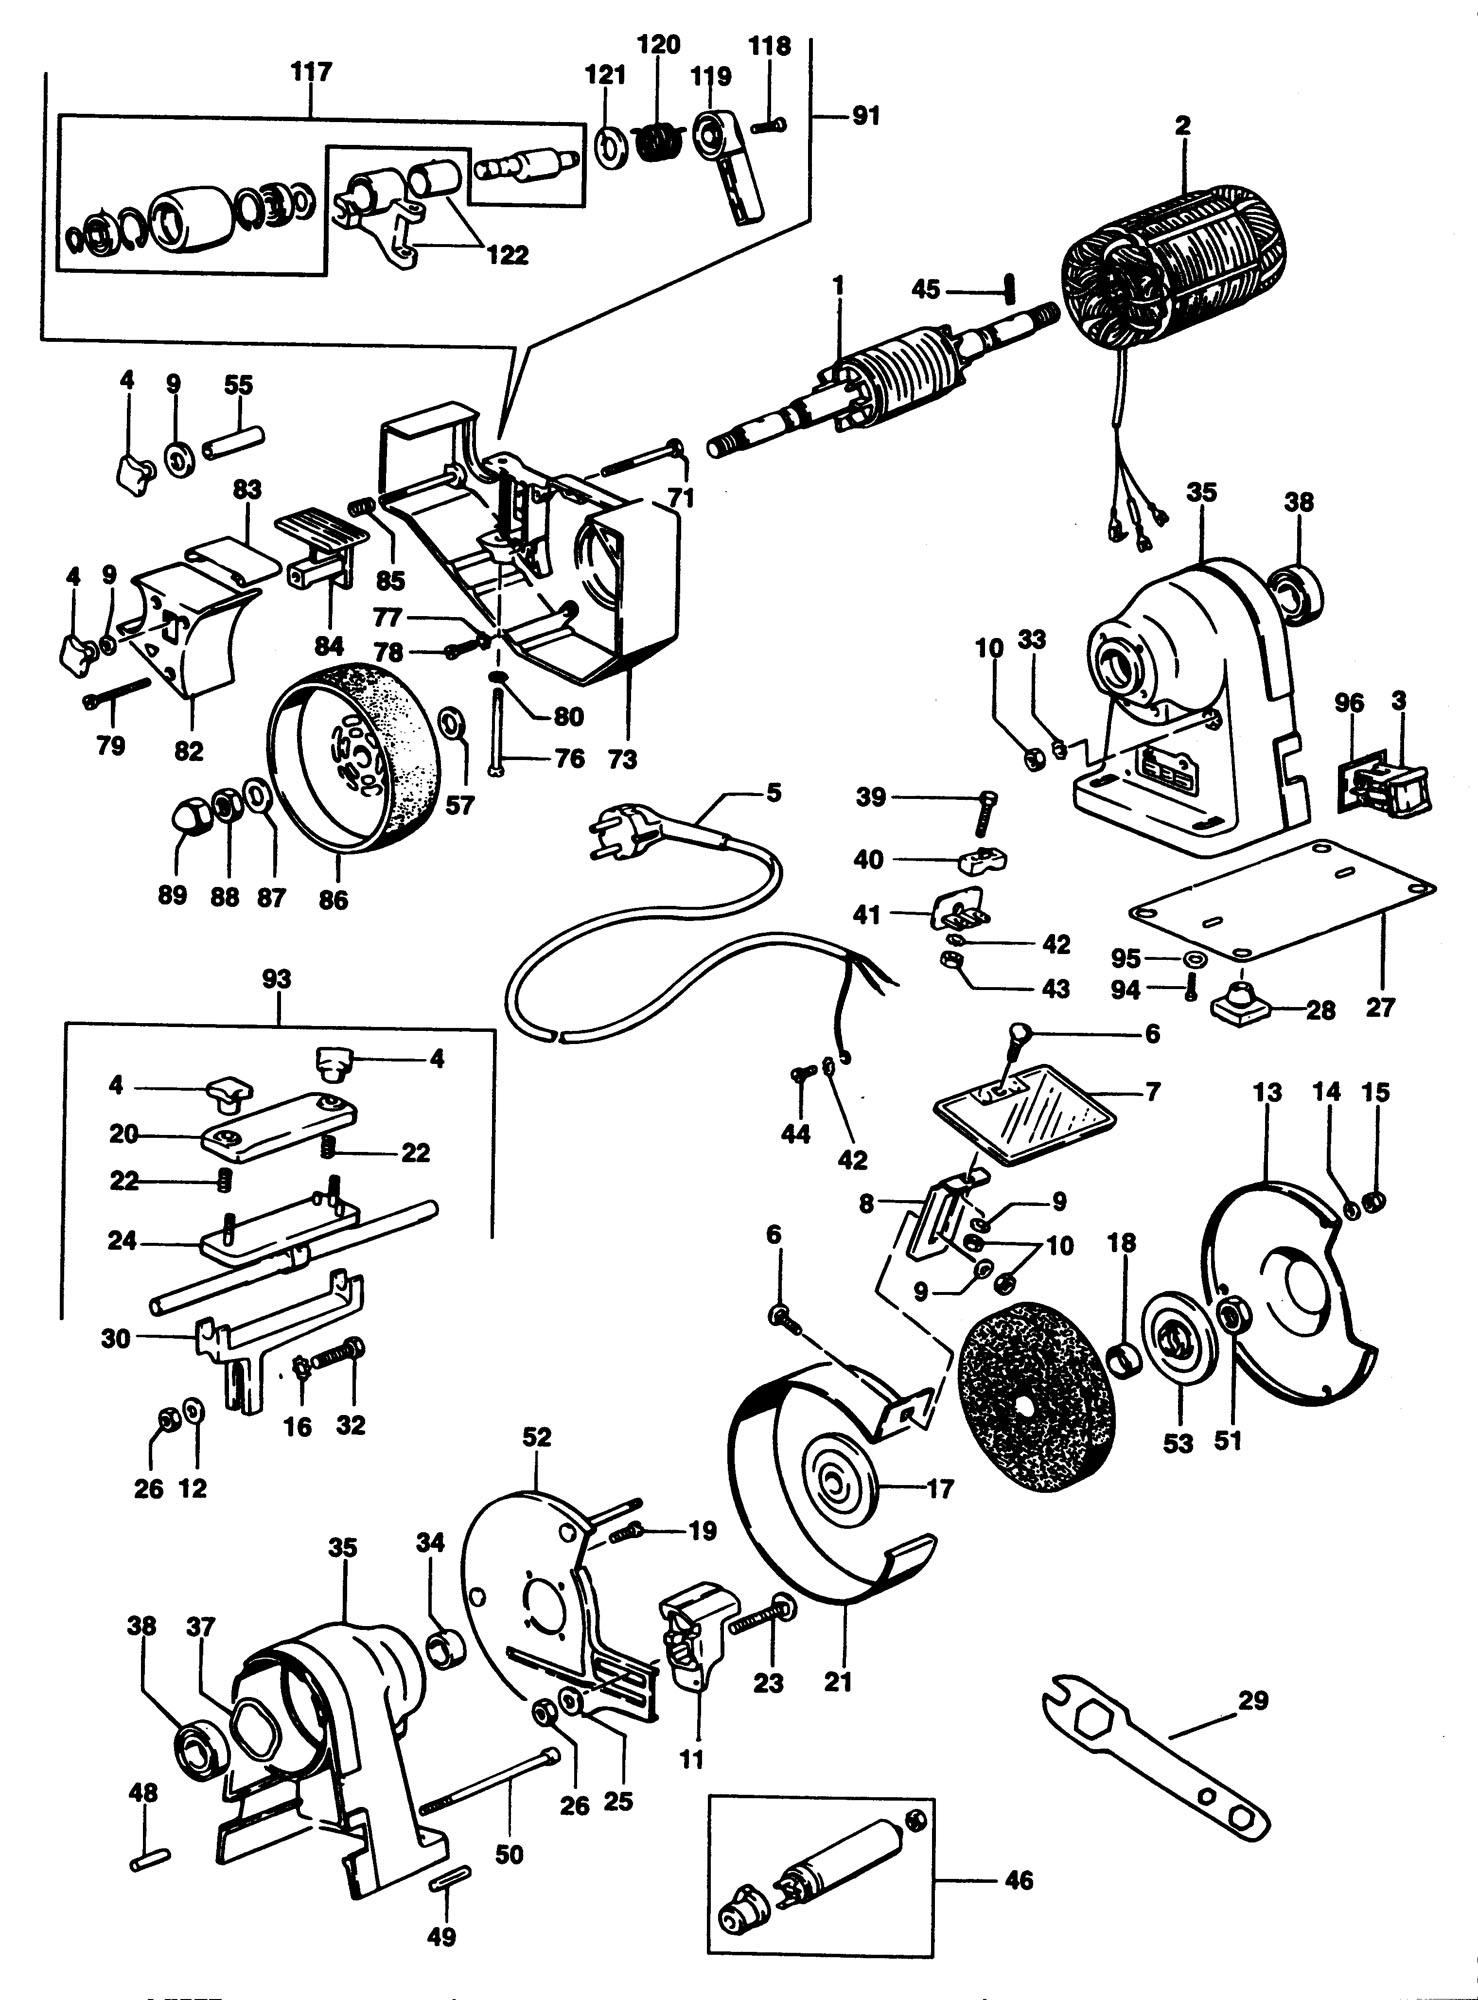 Elu Mwa149 Bench Grinder (type 2) SPARE_MWA149/TYPE_2 from